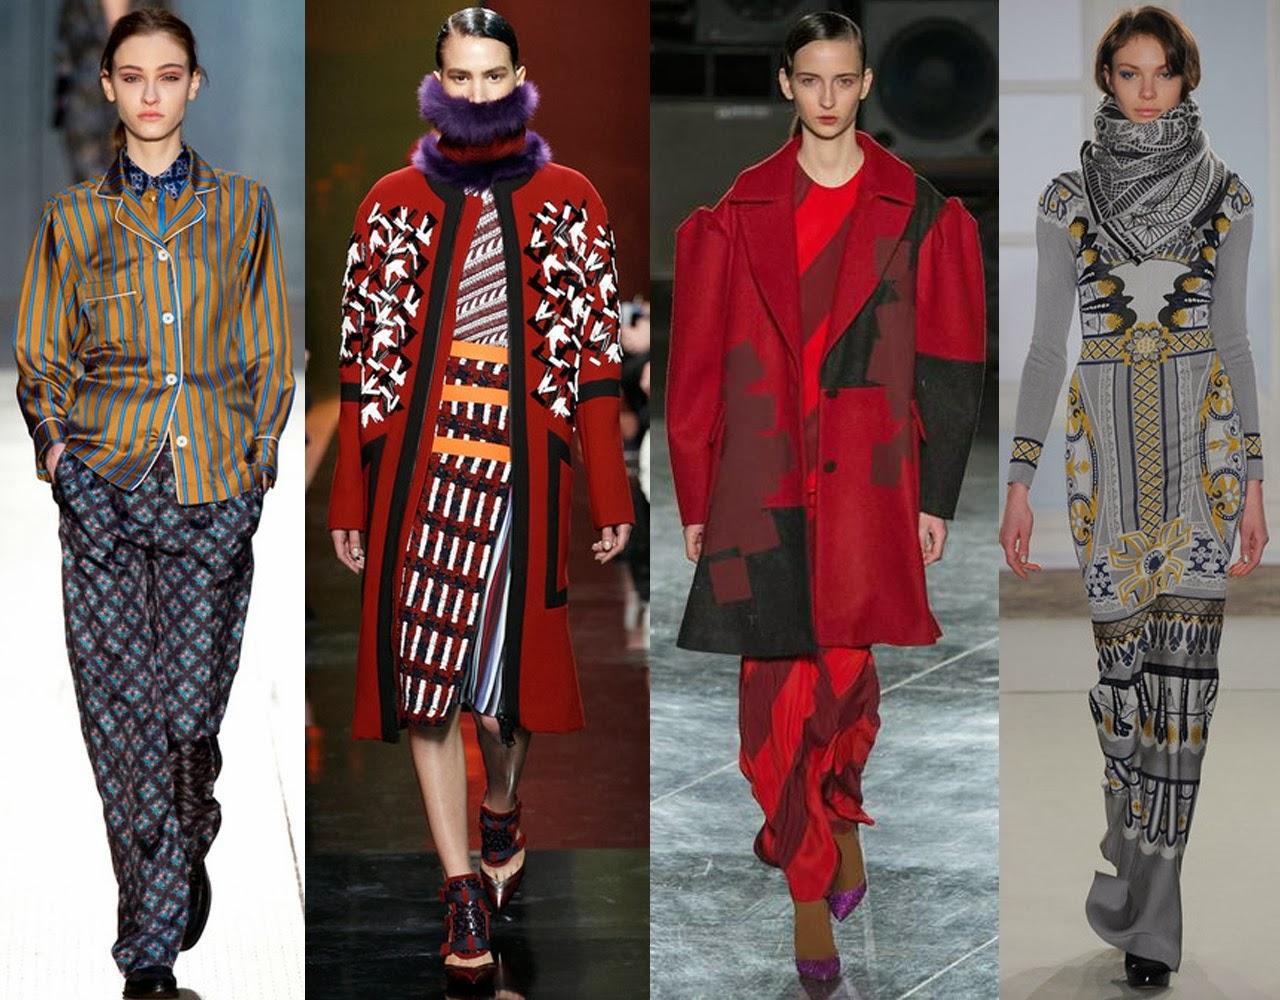 london+fashion+week+fall+2014+trends